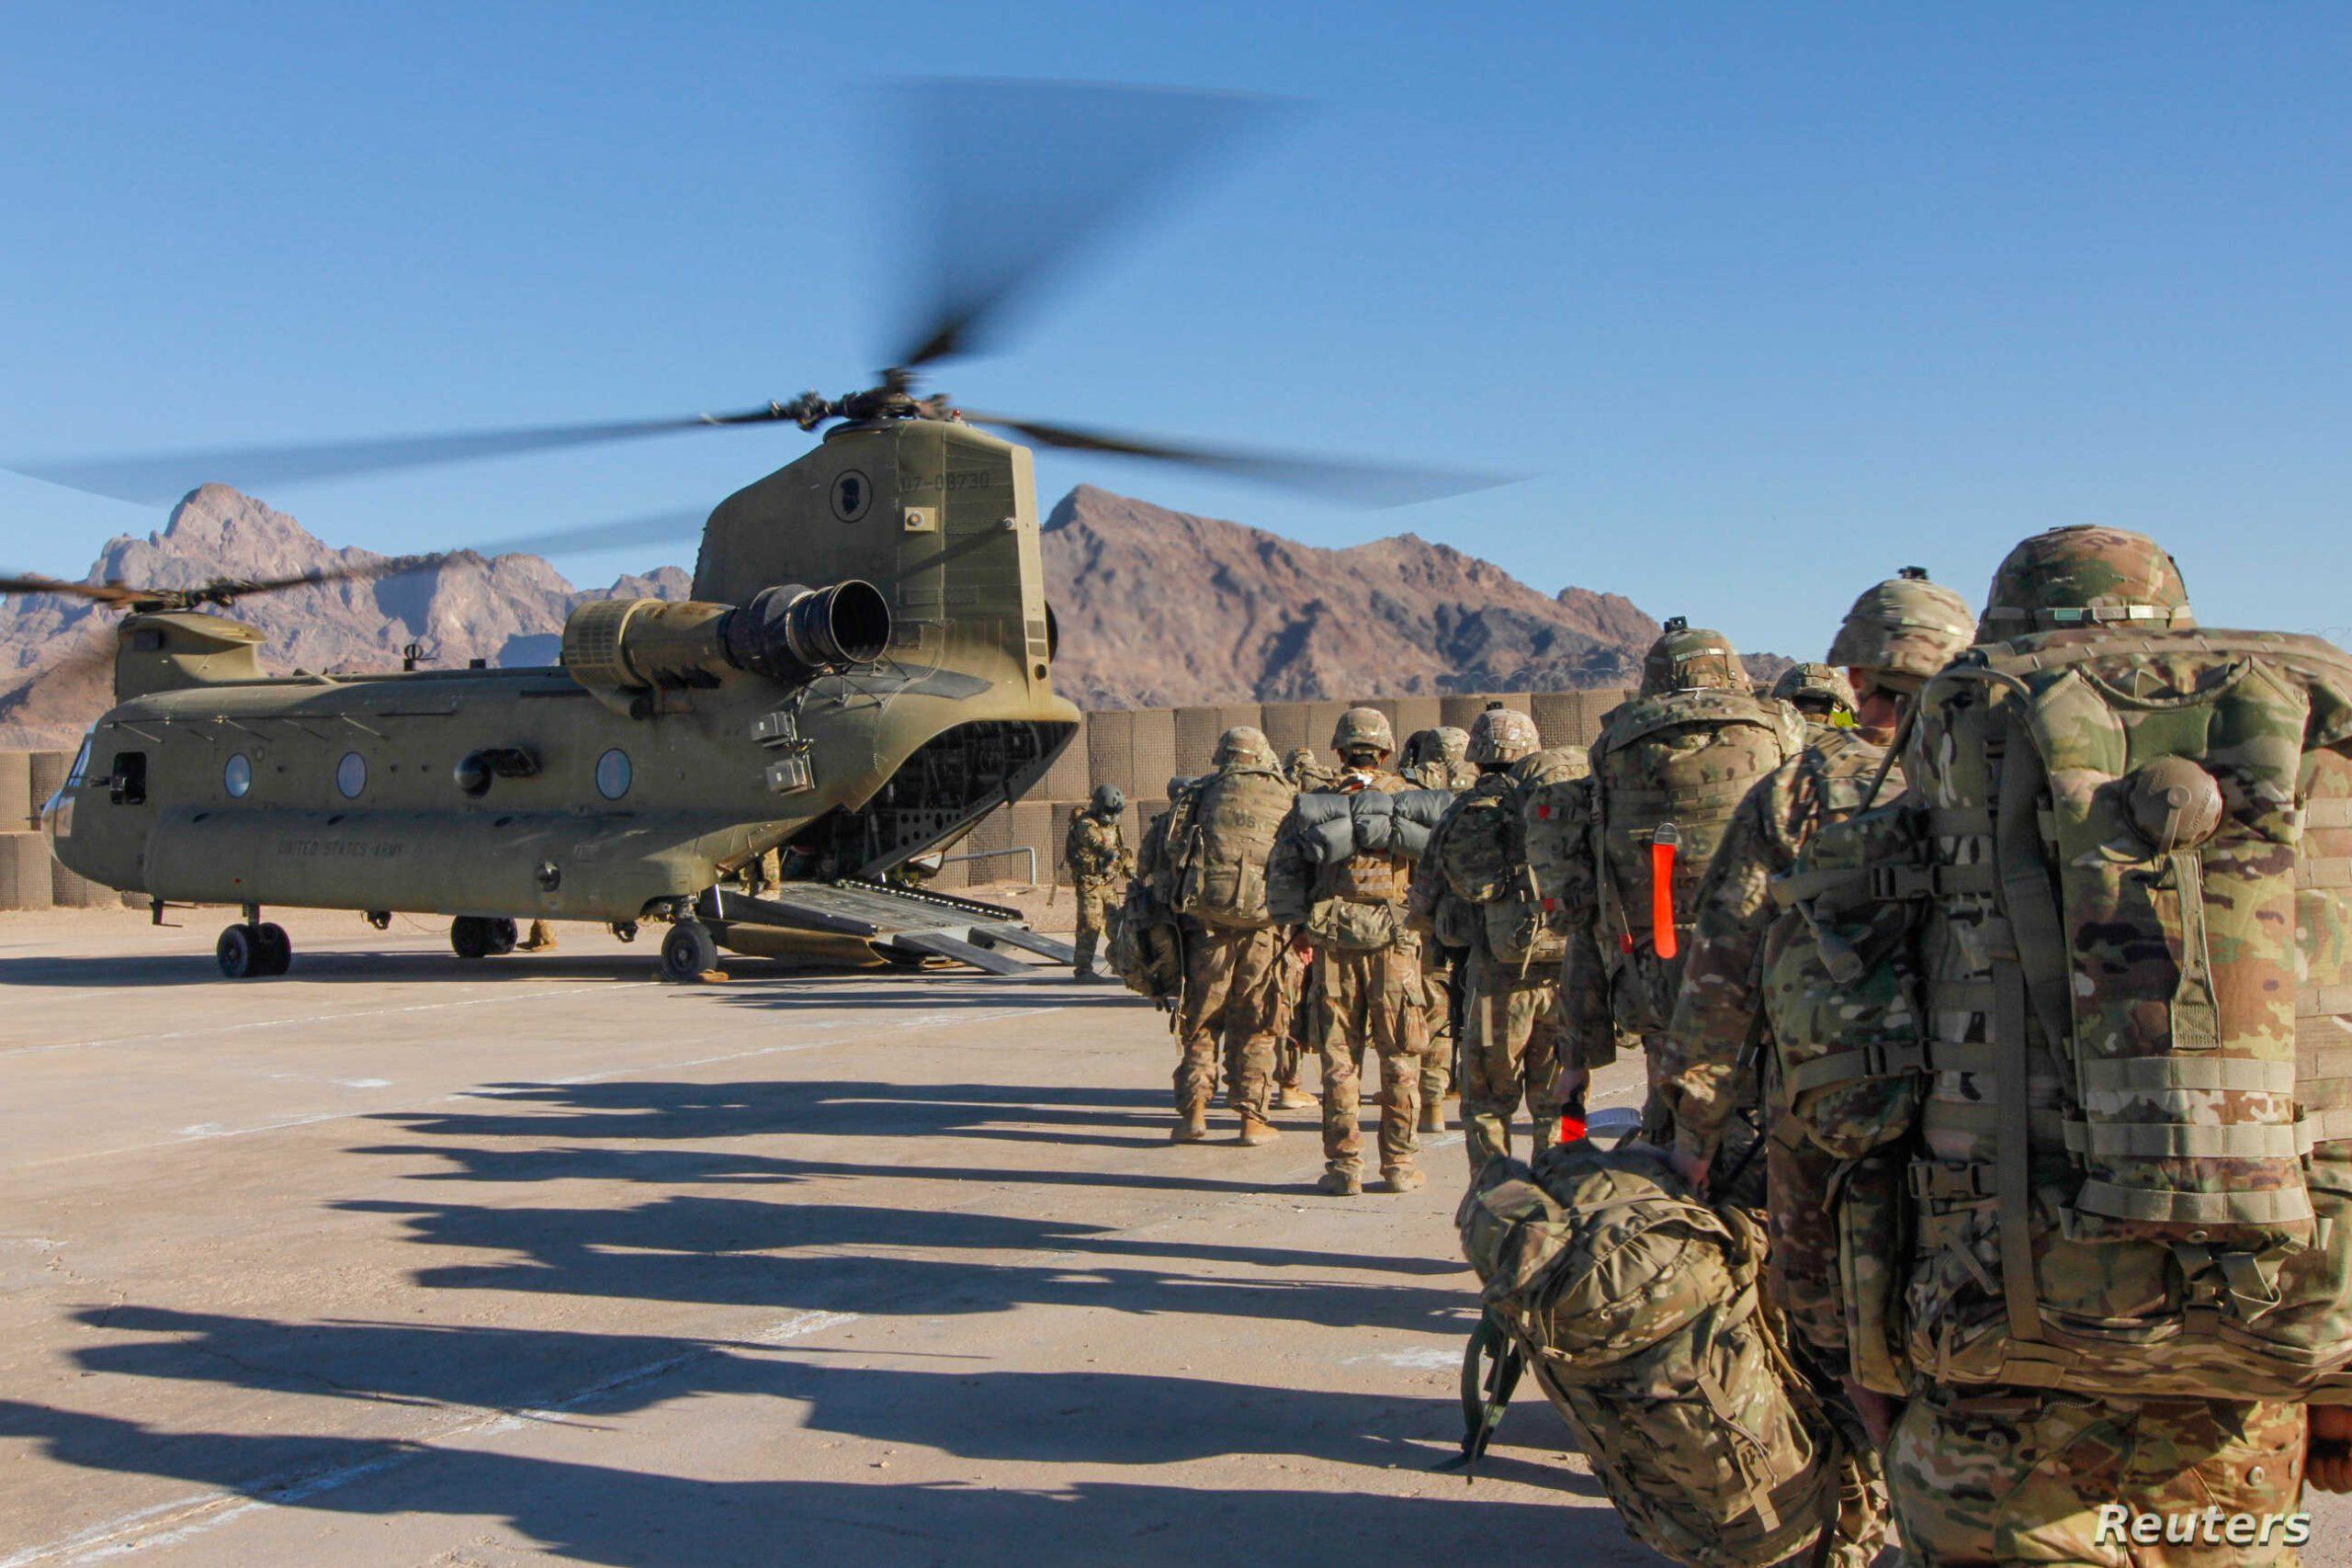 Will US Troops Leave Afghanistan as Announced? By Kamran Yousaf